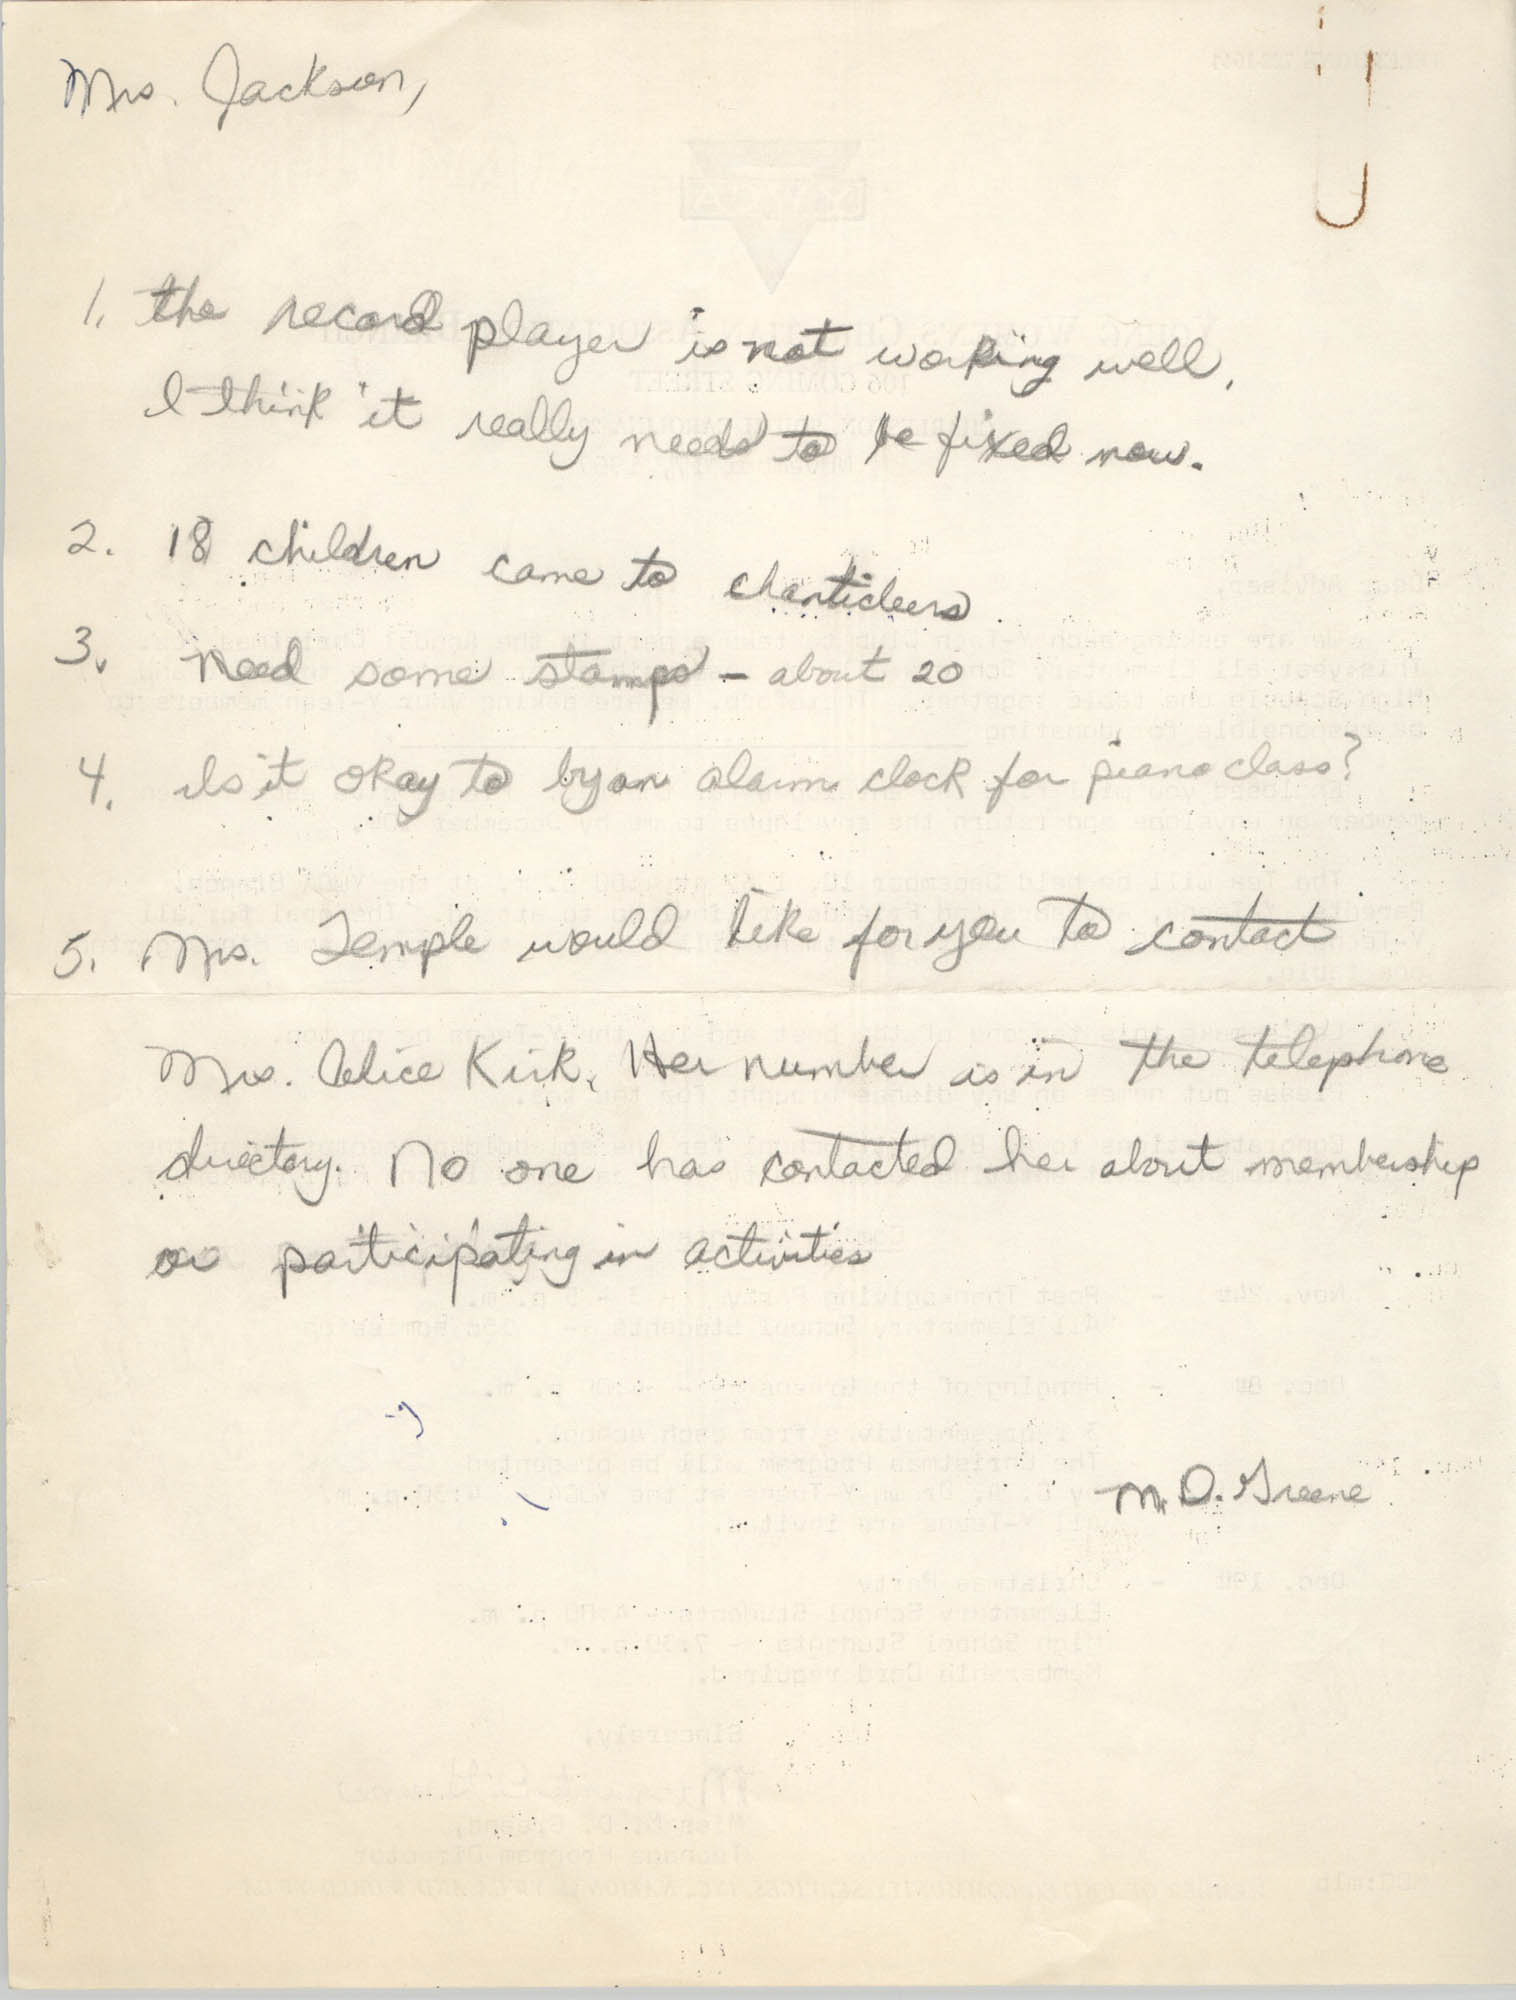 Letter from Marguerite D. Greene to Christine O. Jackson, 1967